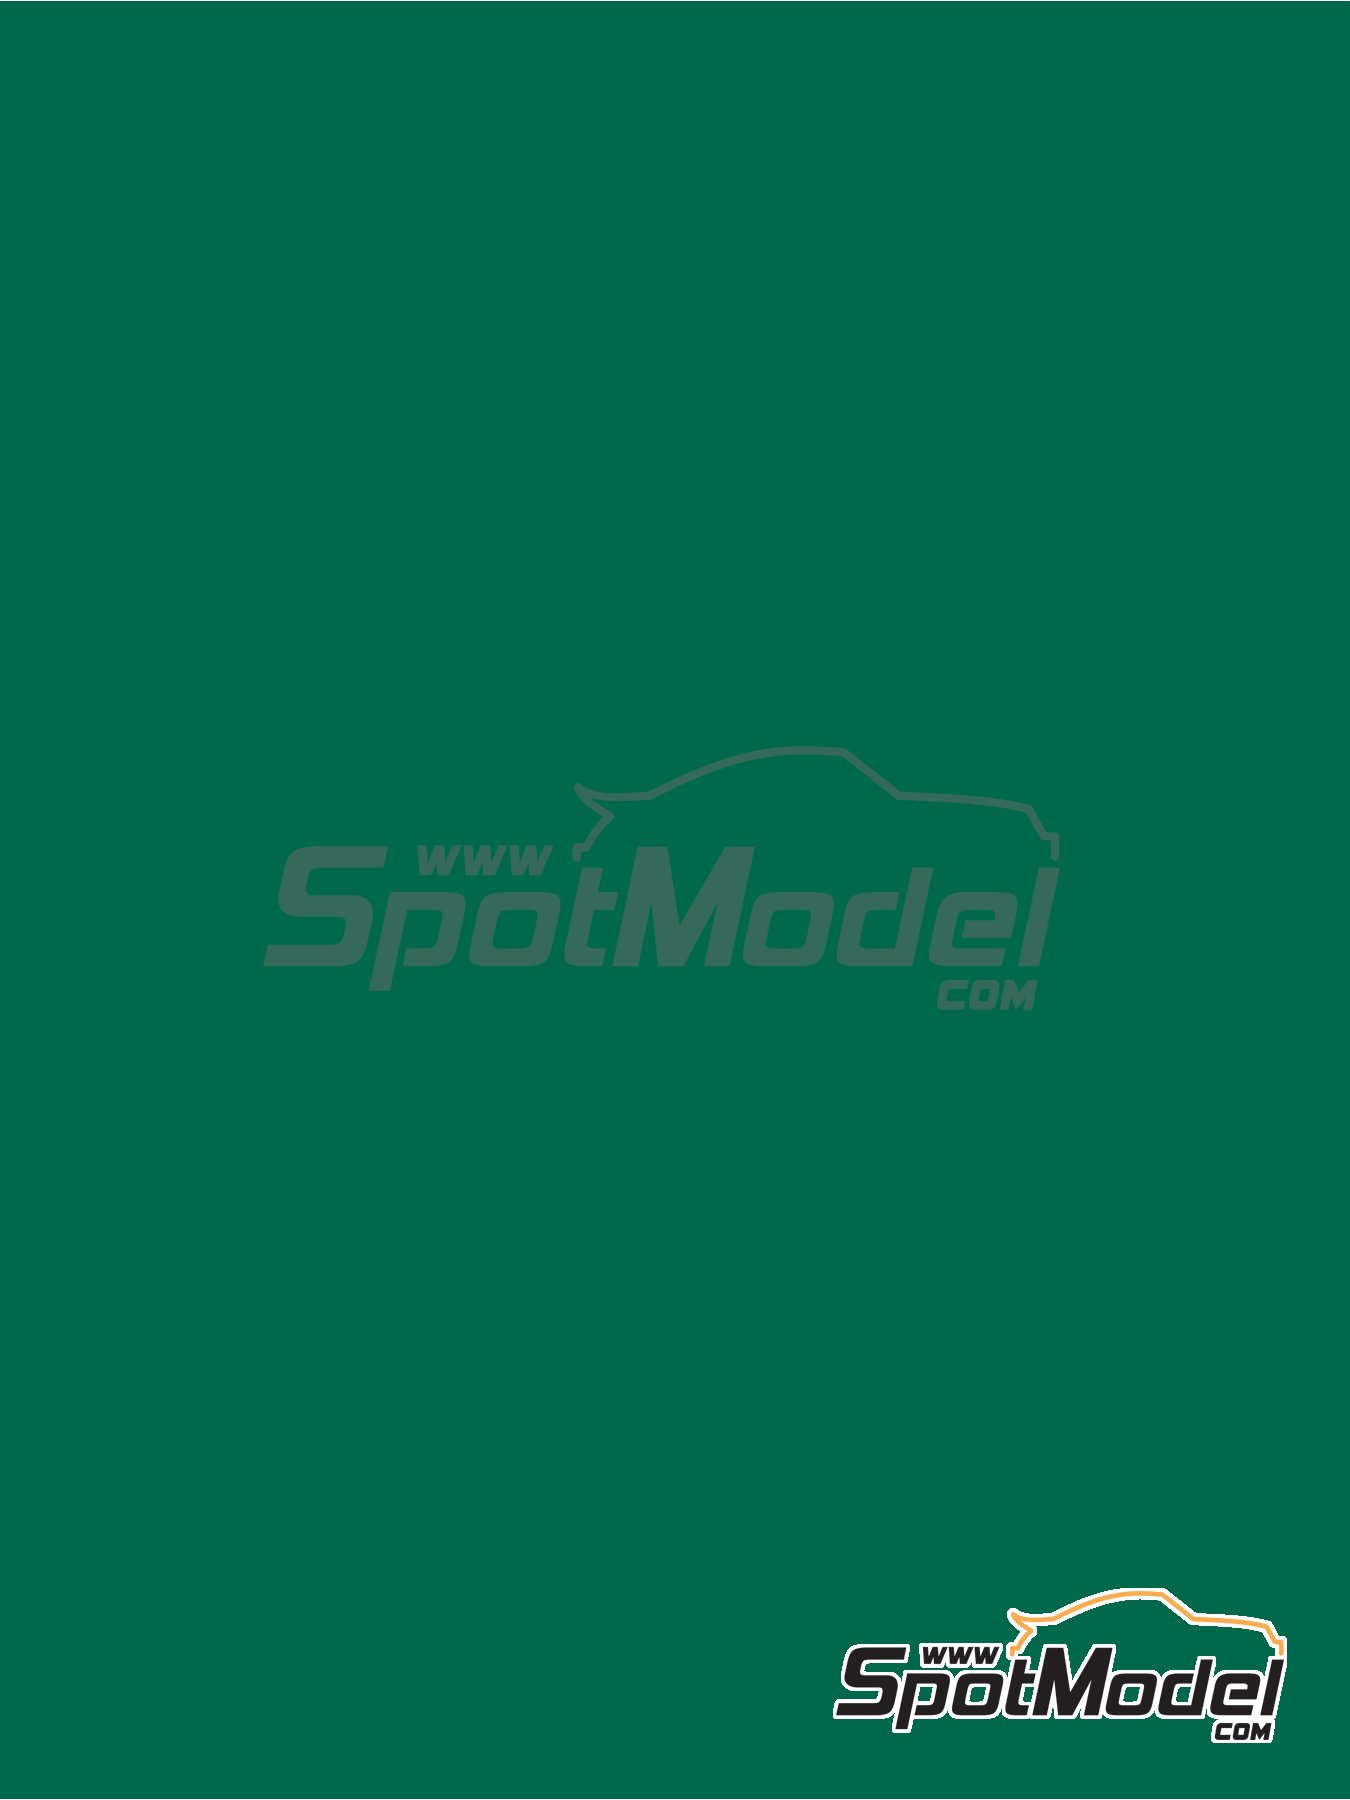 Verde turquesa - RAL6016 - Turquoise green - 1 x 60ml | Pintura fabricado por Zero Paints (ref.ZP-1033-RAL6016) image